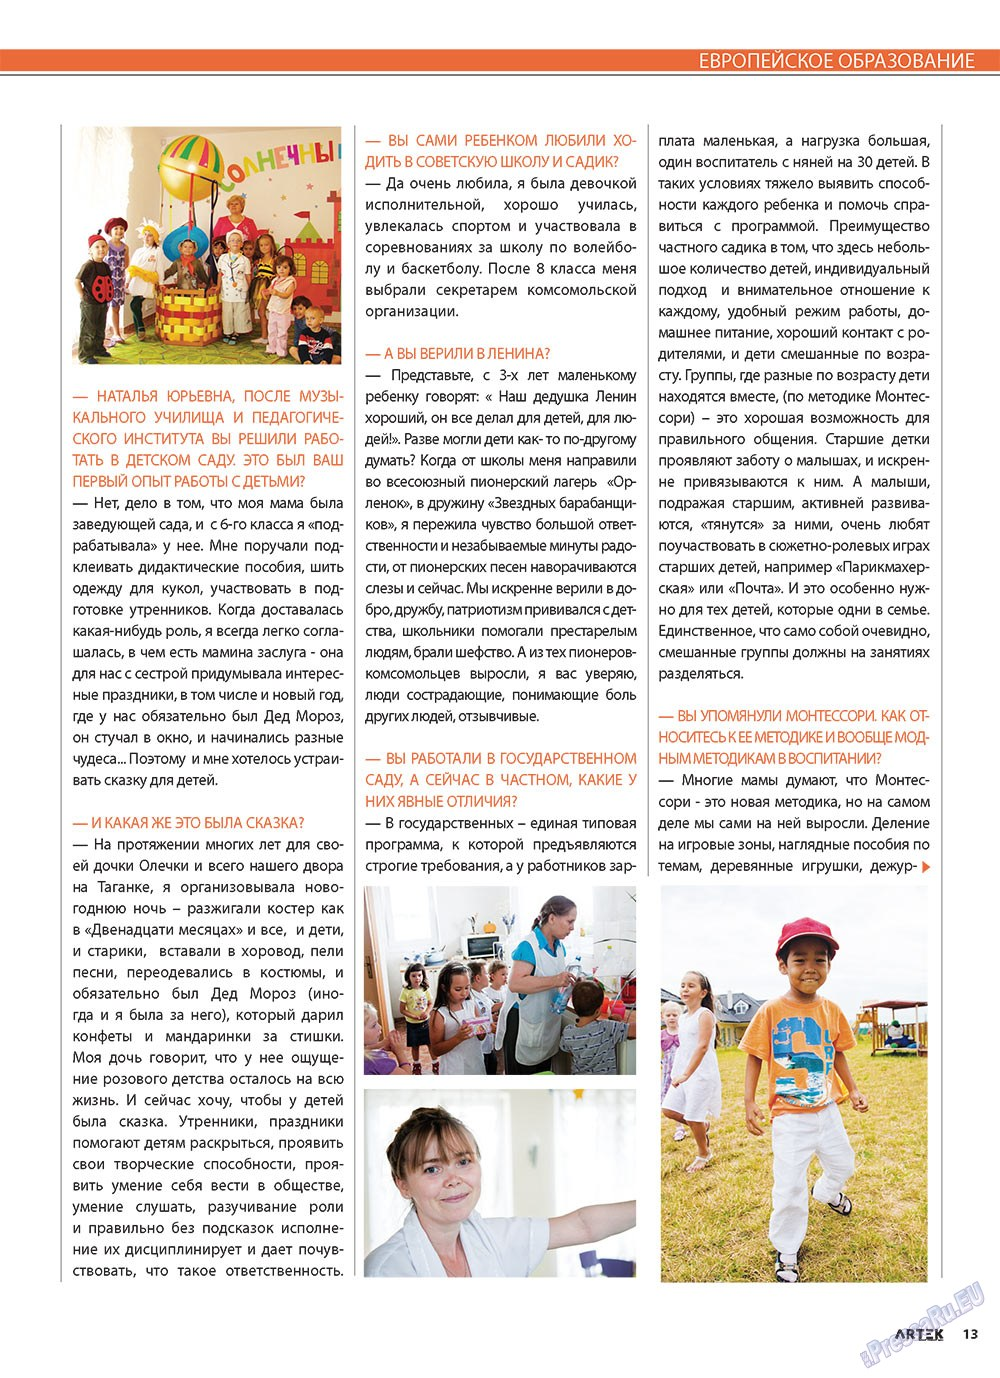 Артек (журнал). 2010 год, номер 4, стр. 15